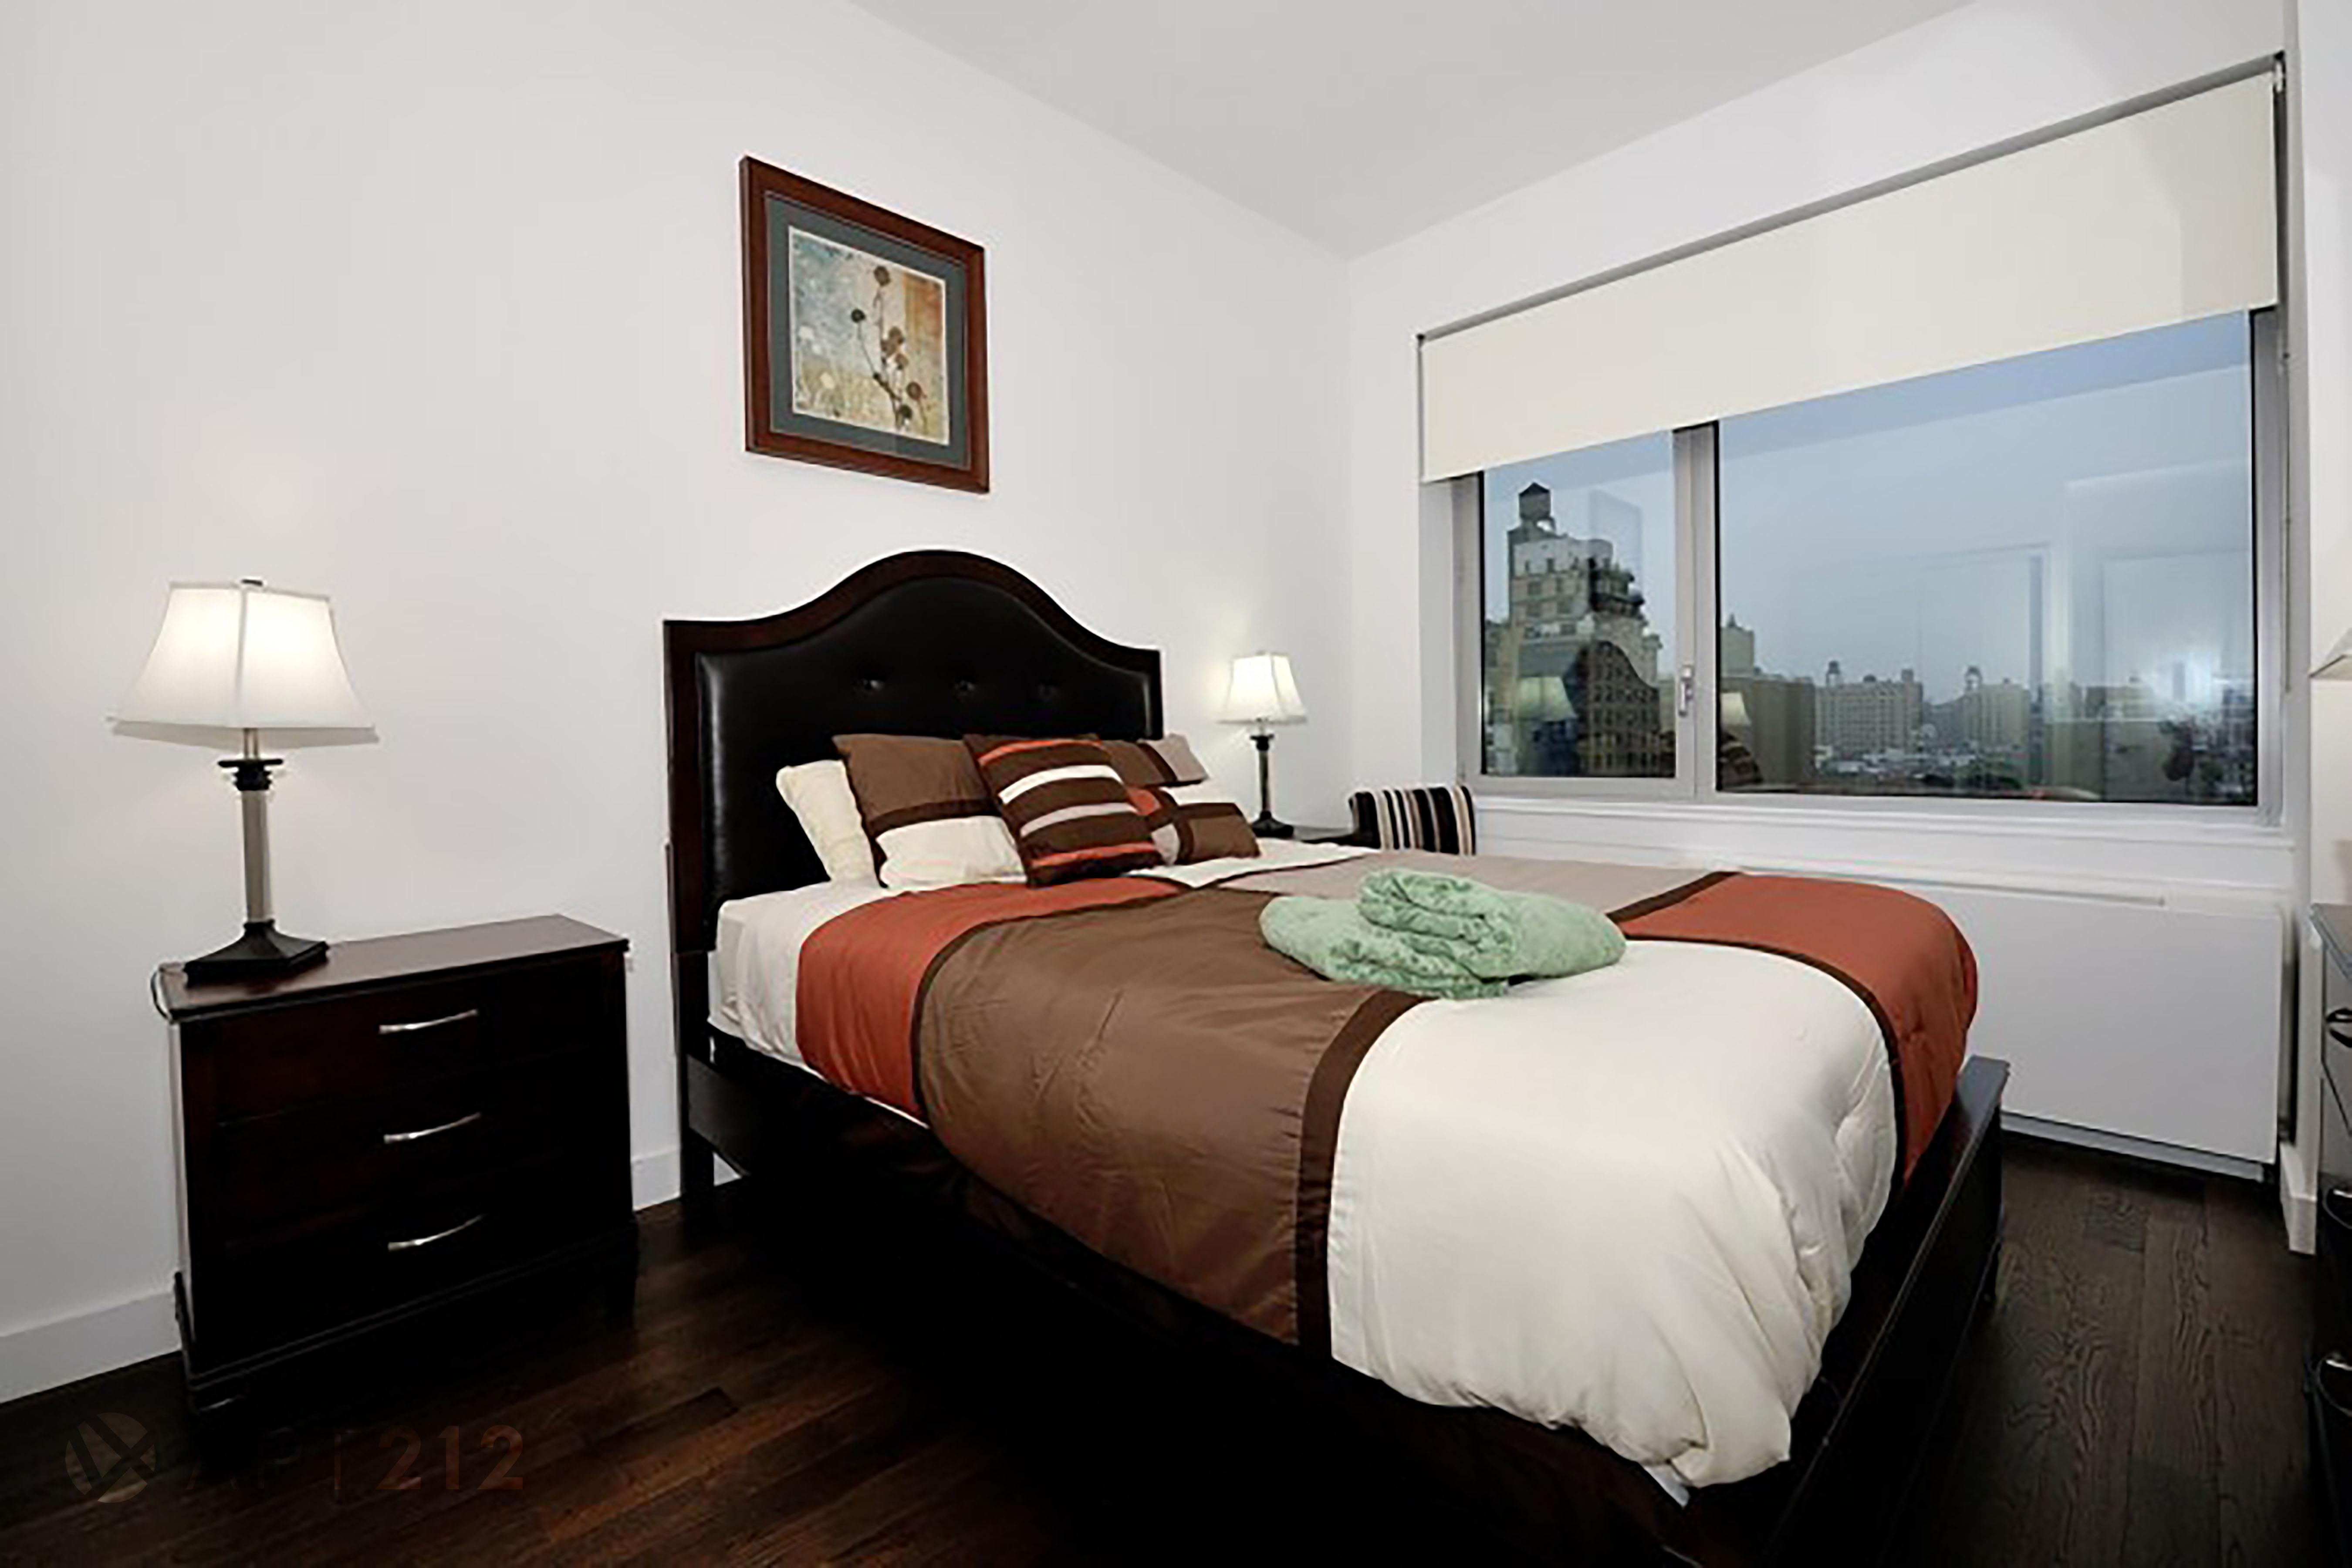 801 Amsterdam Ave New York Ny 10025 Apartable